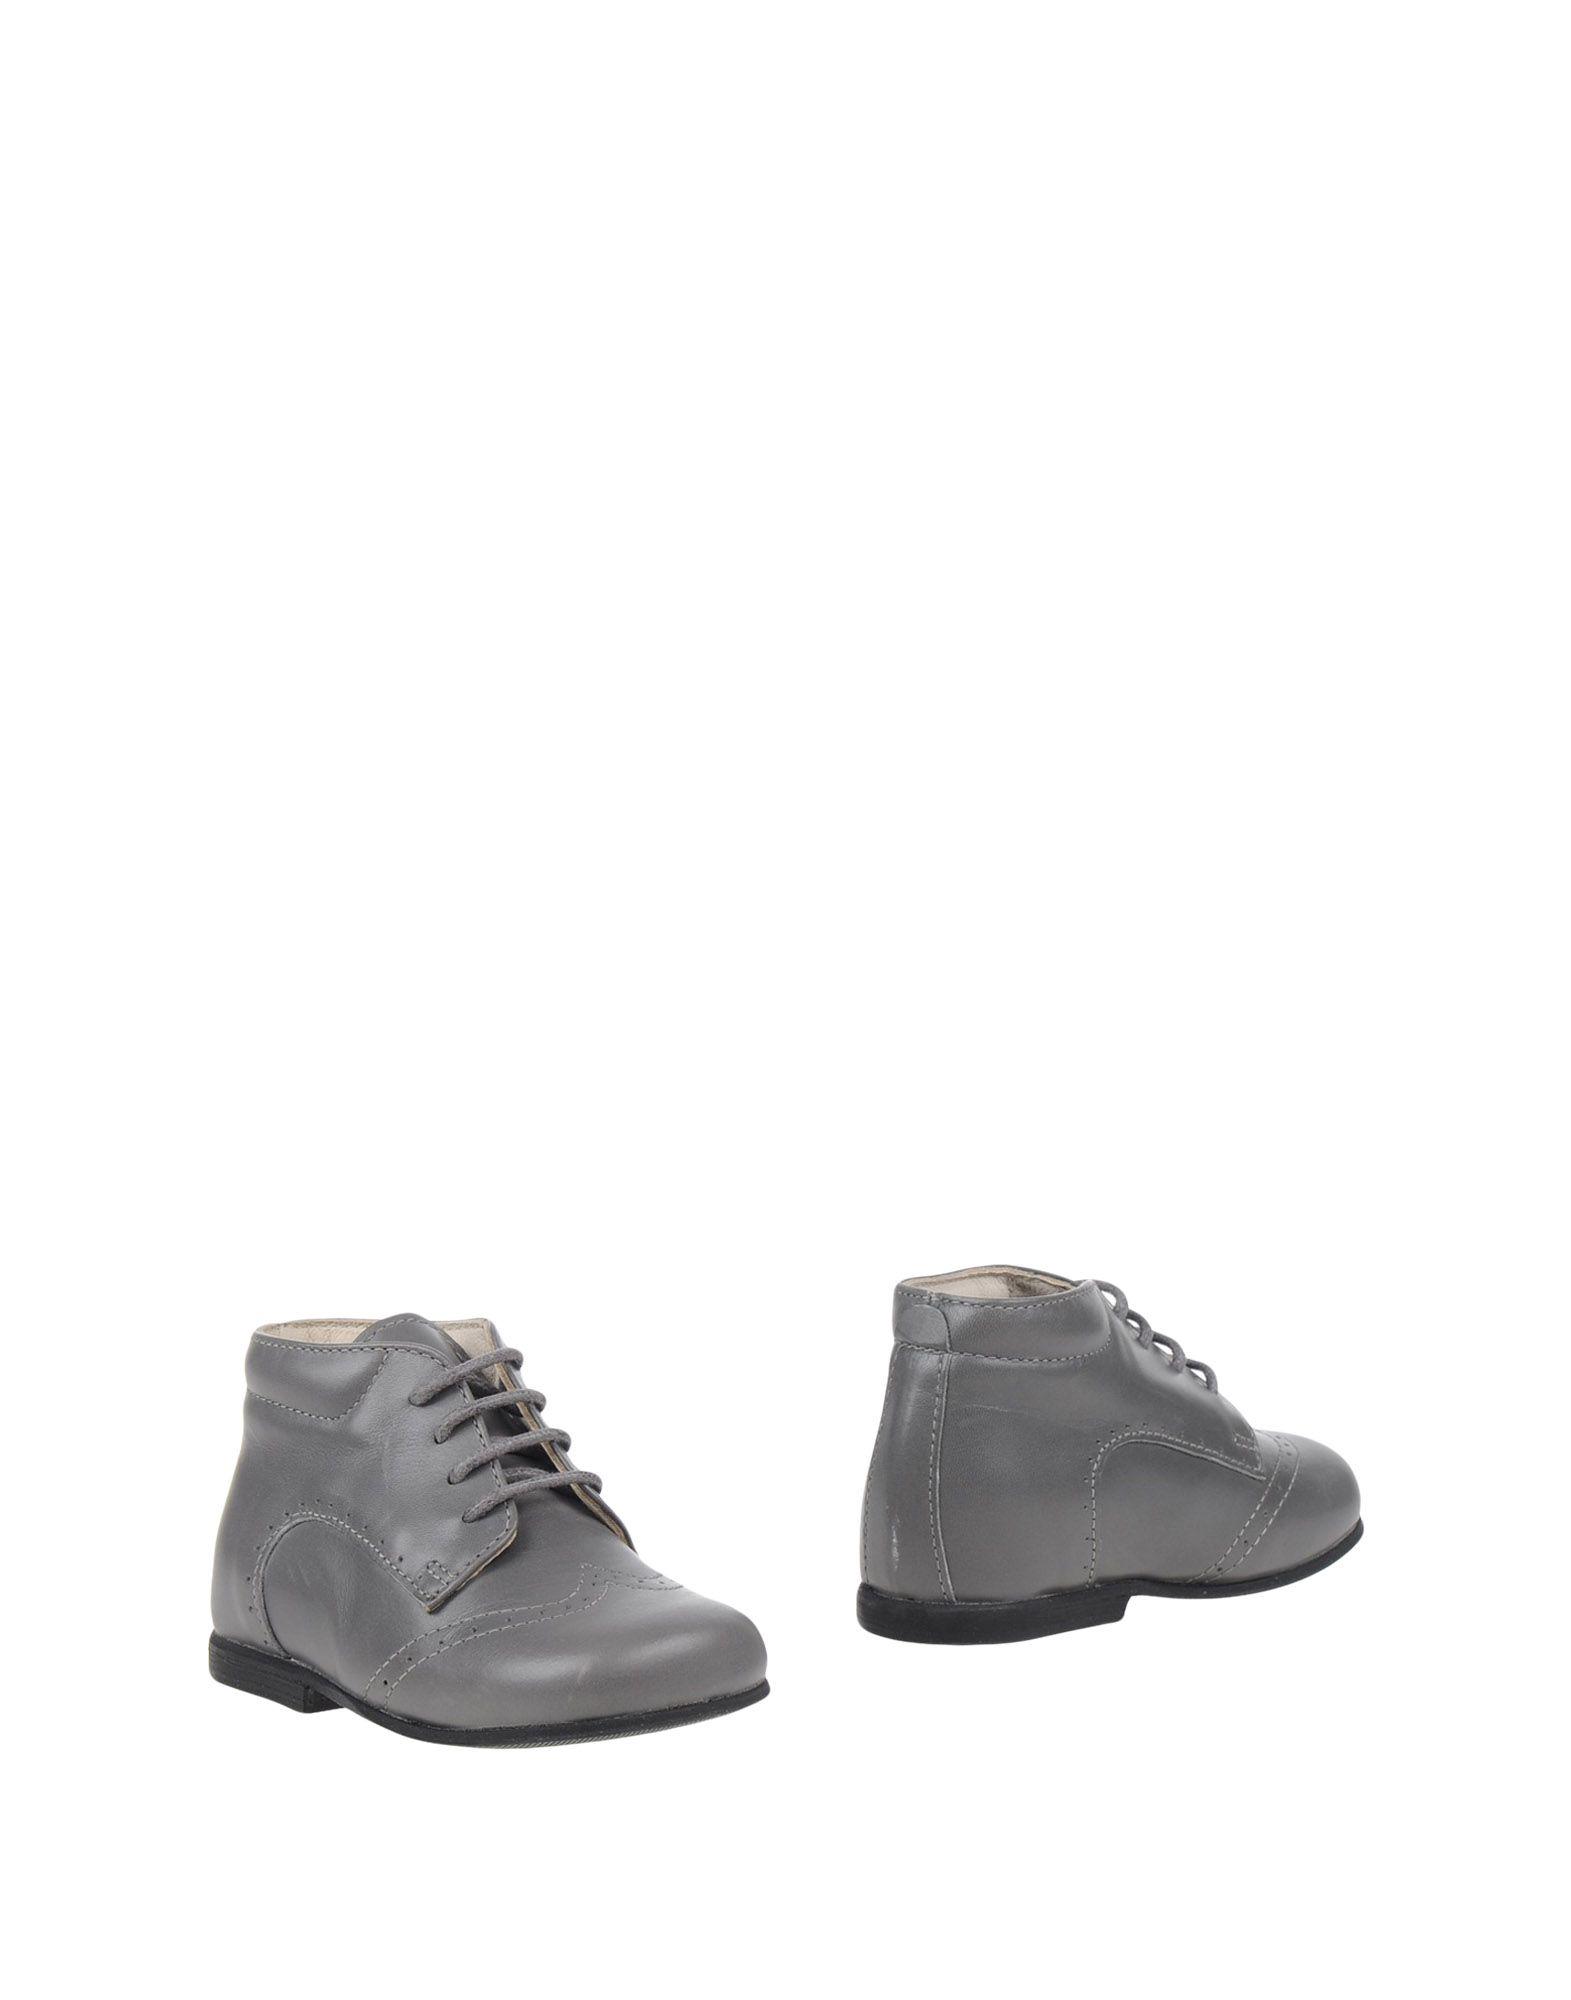 GALLUCCI Jungen 0-24 monate Stiefelette Farbe Grau Größe 38